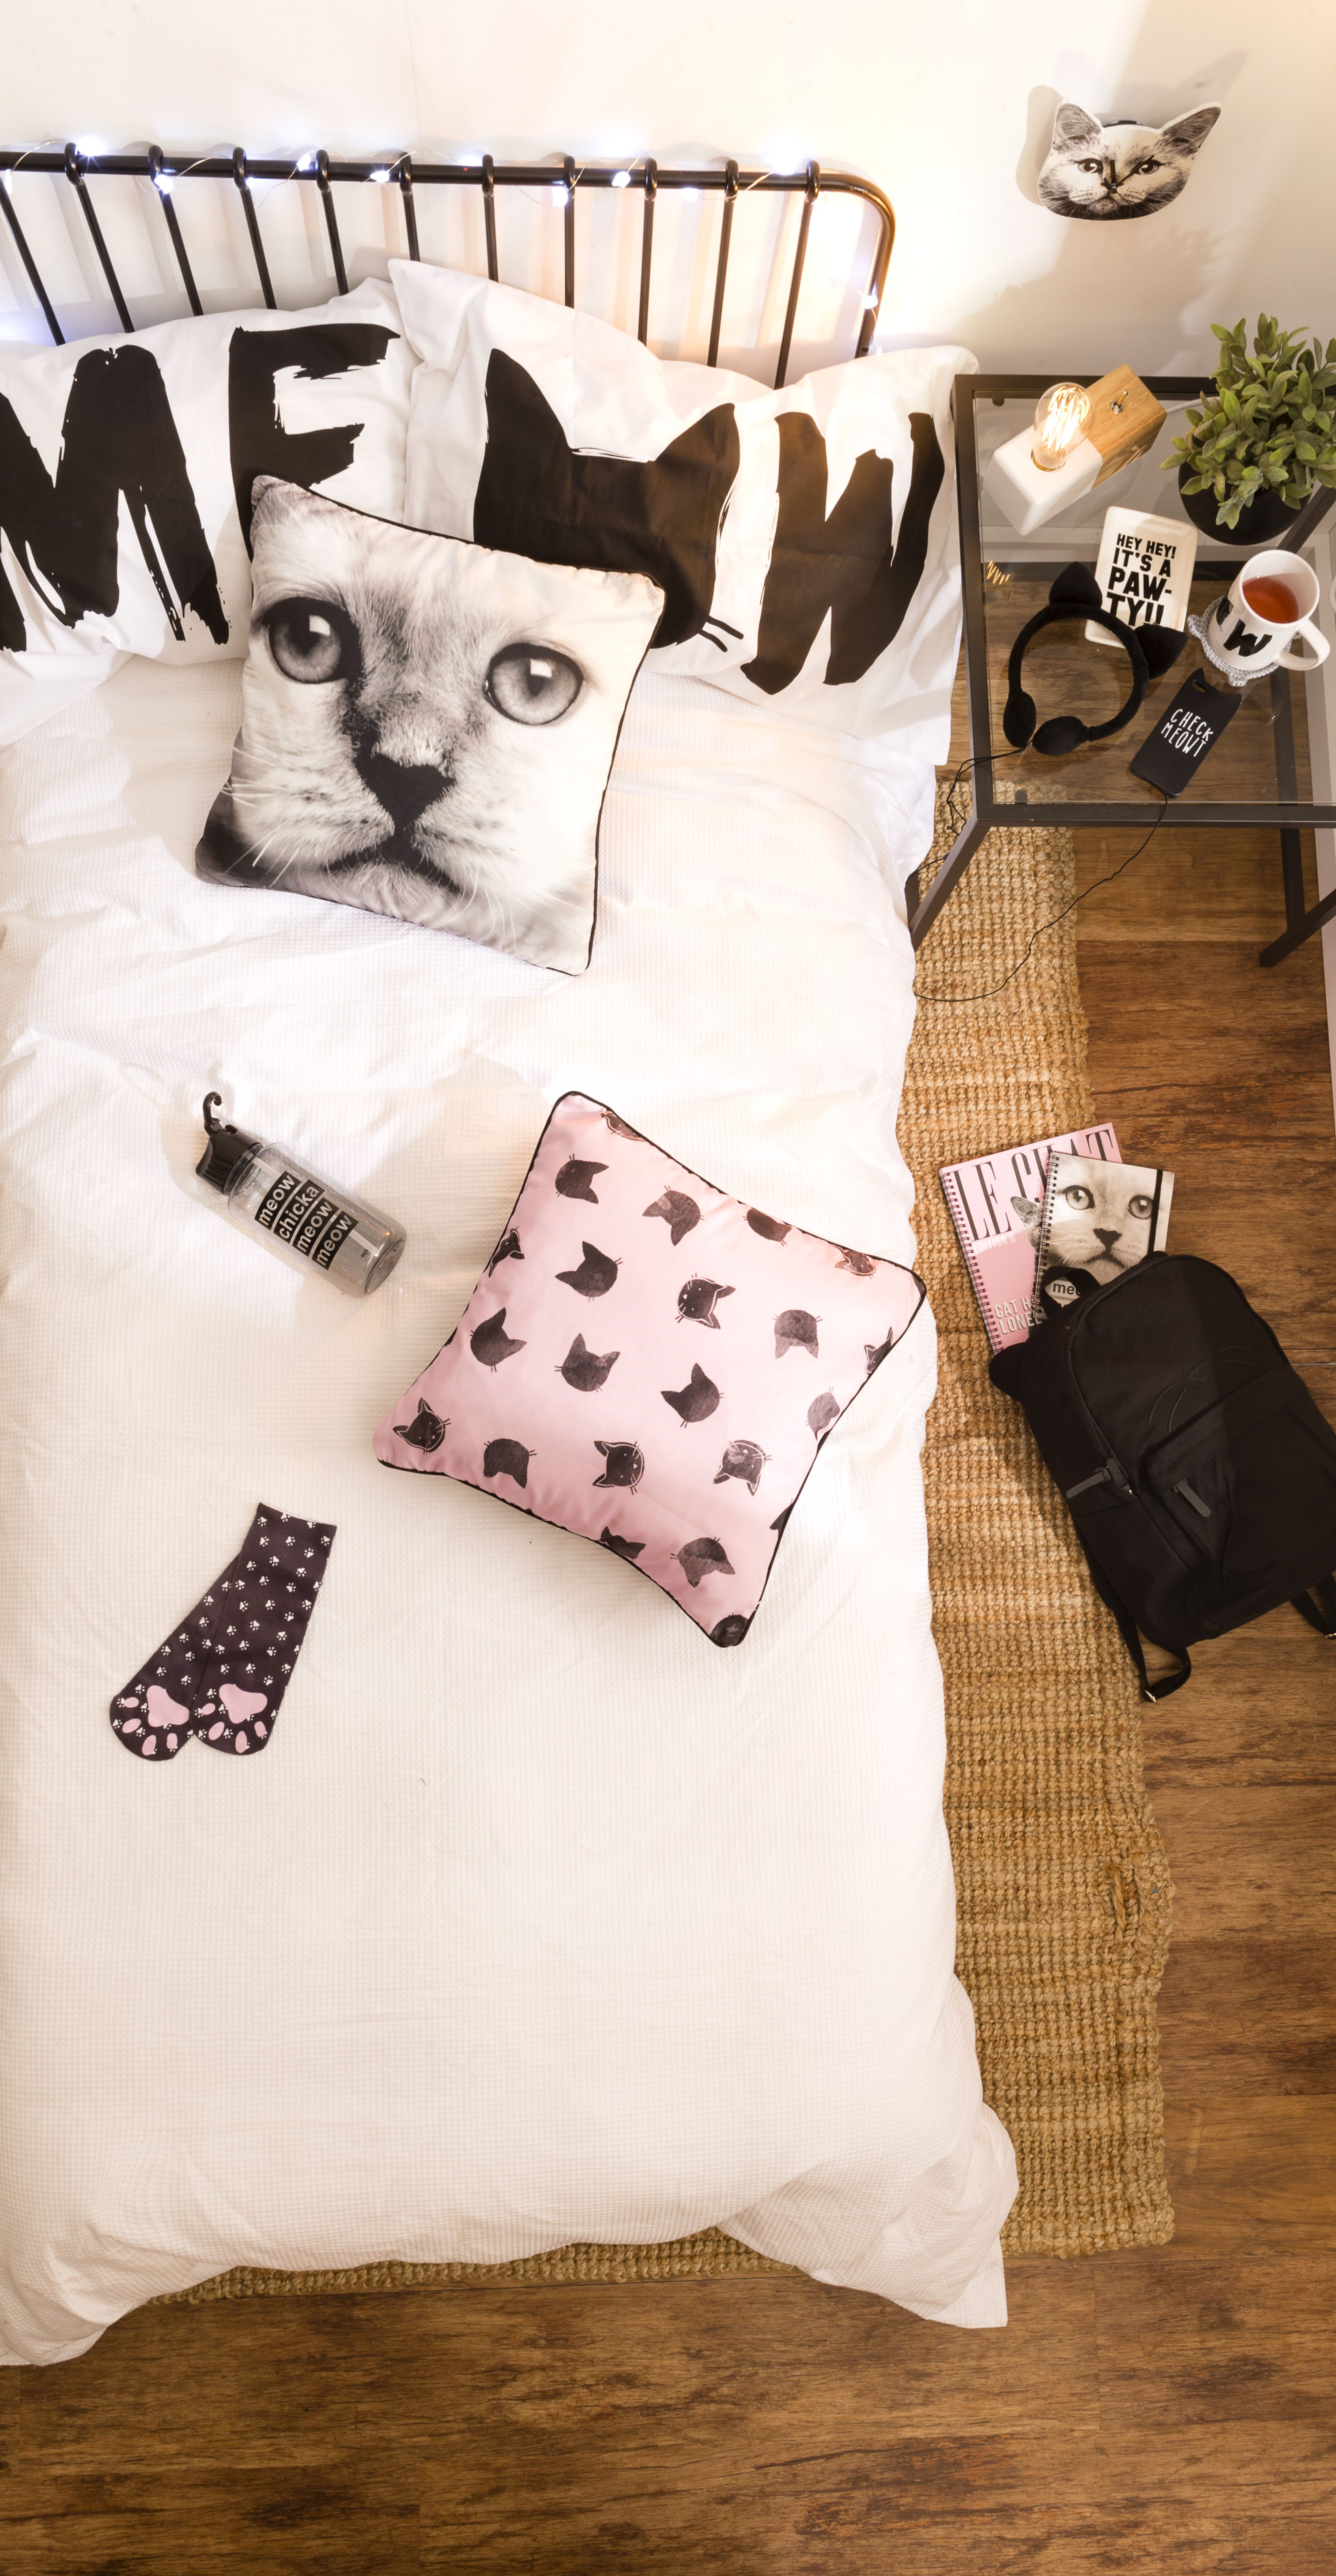 . meow chika meow meow  typoshop   Joss room   Cat bedroom  Cat room